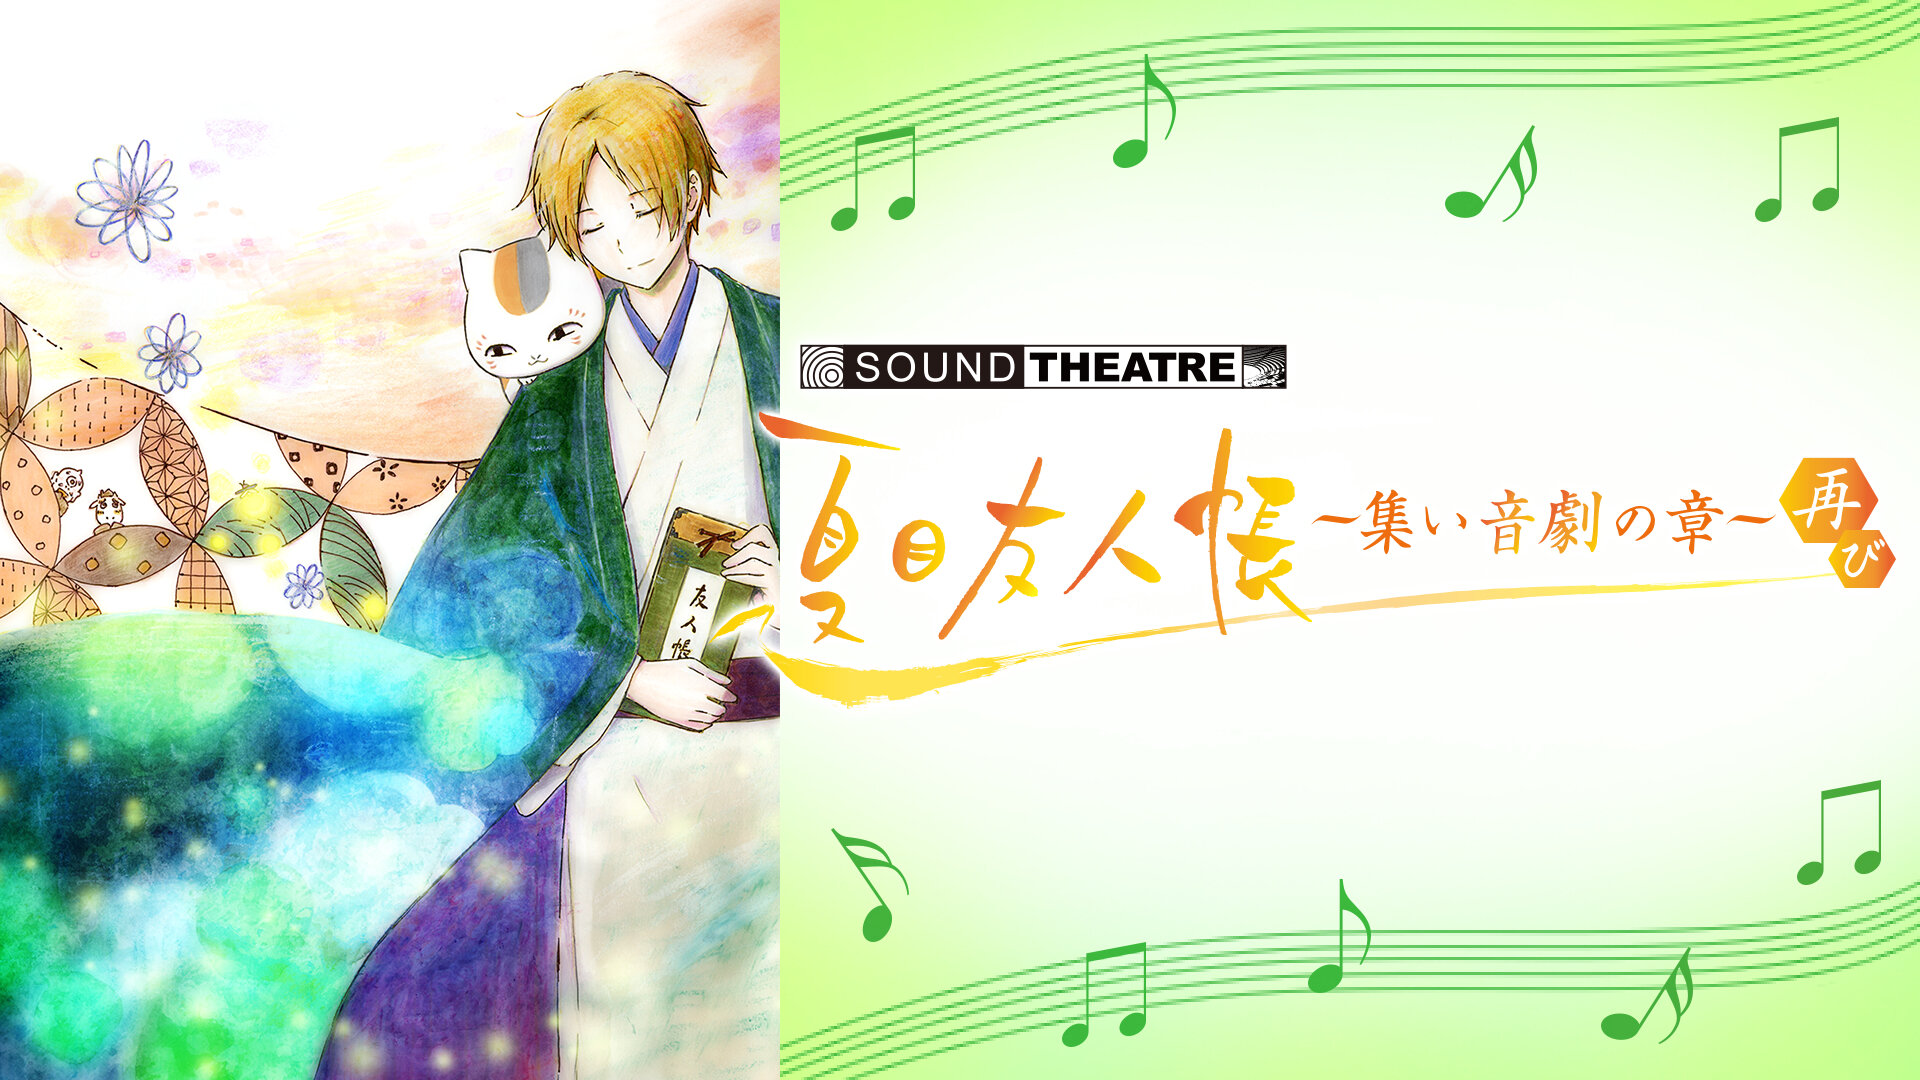 SOUND THEATRE × 夏目友人帳 ~集い 音劇の章・再び~